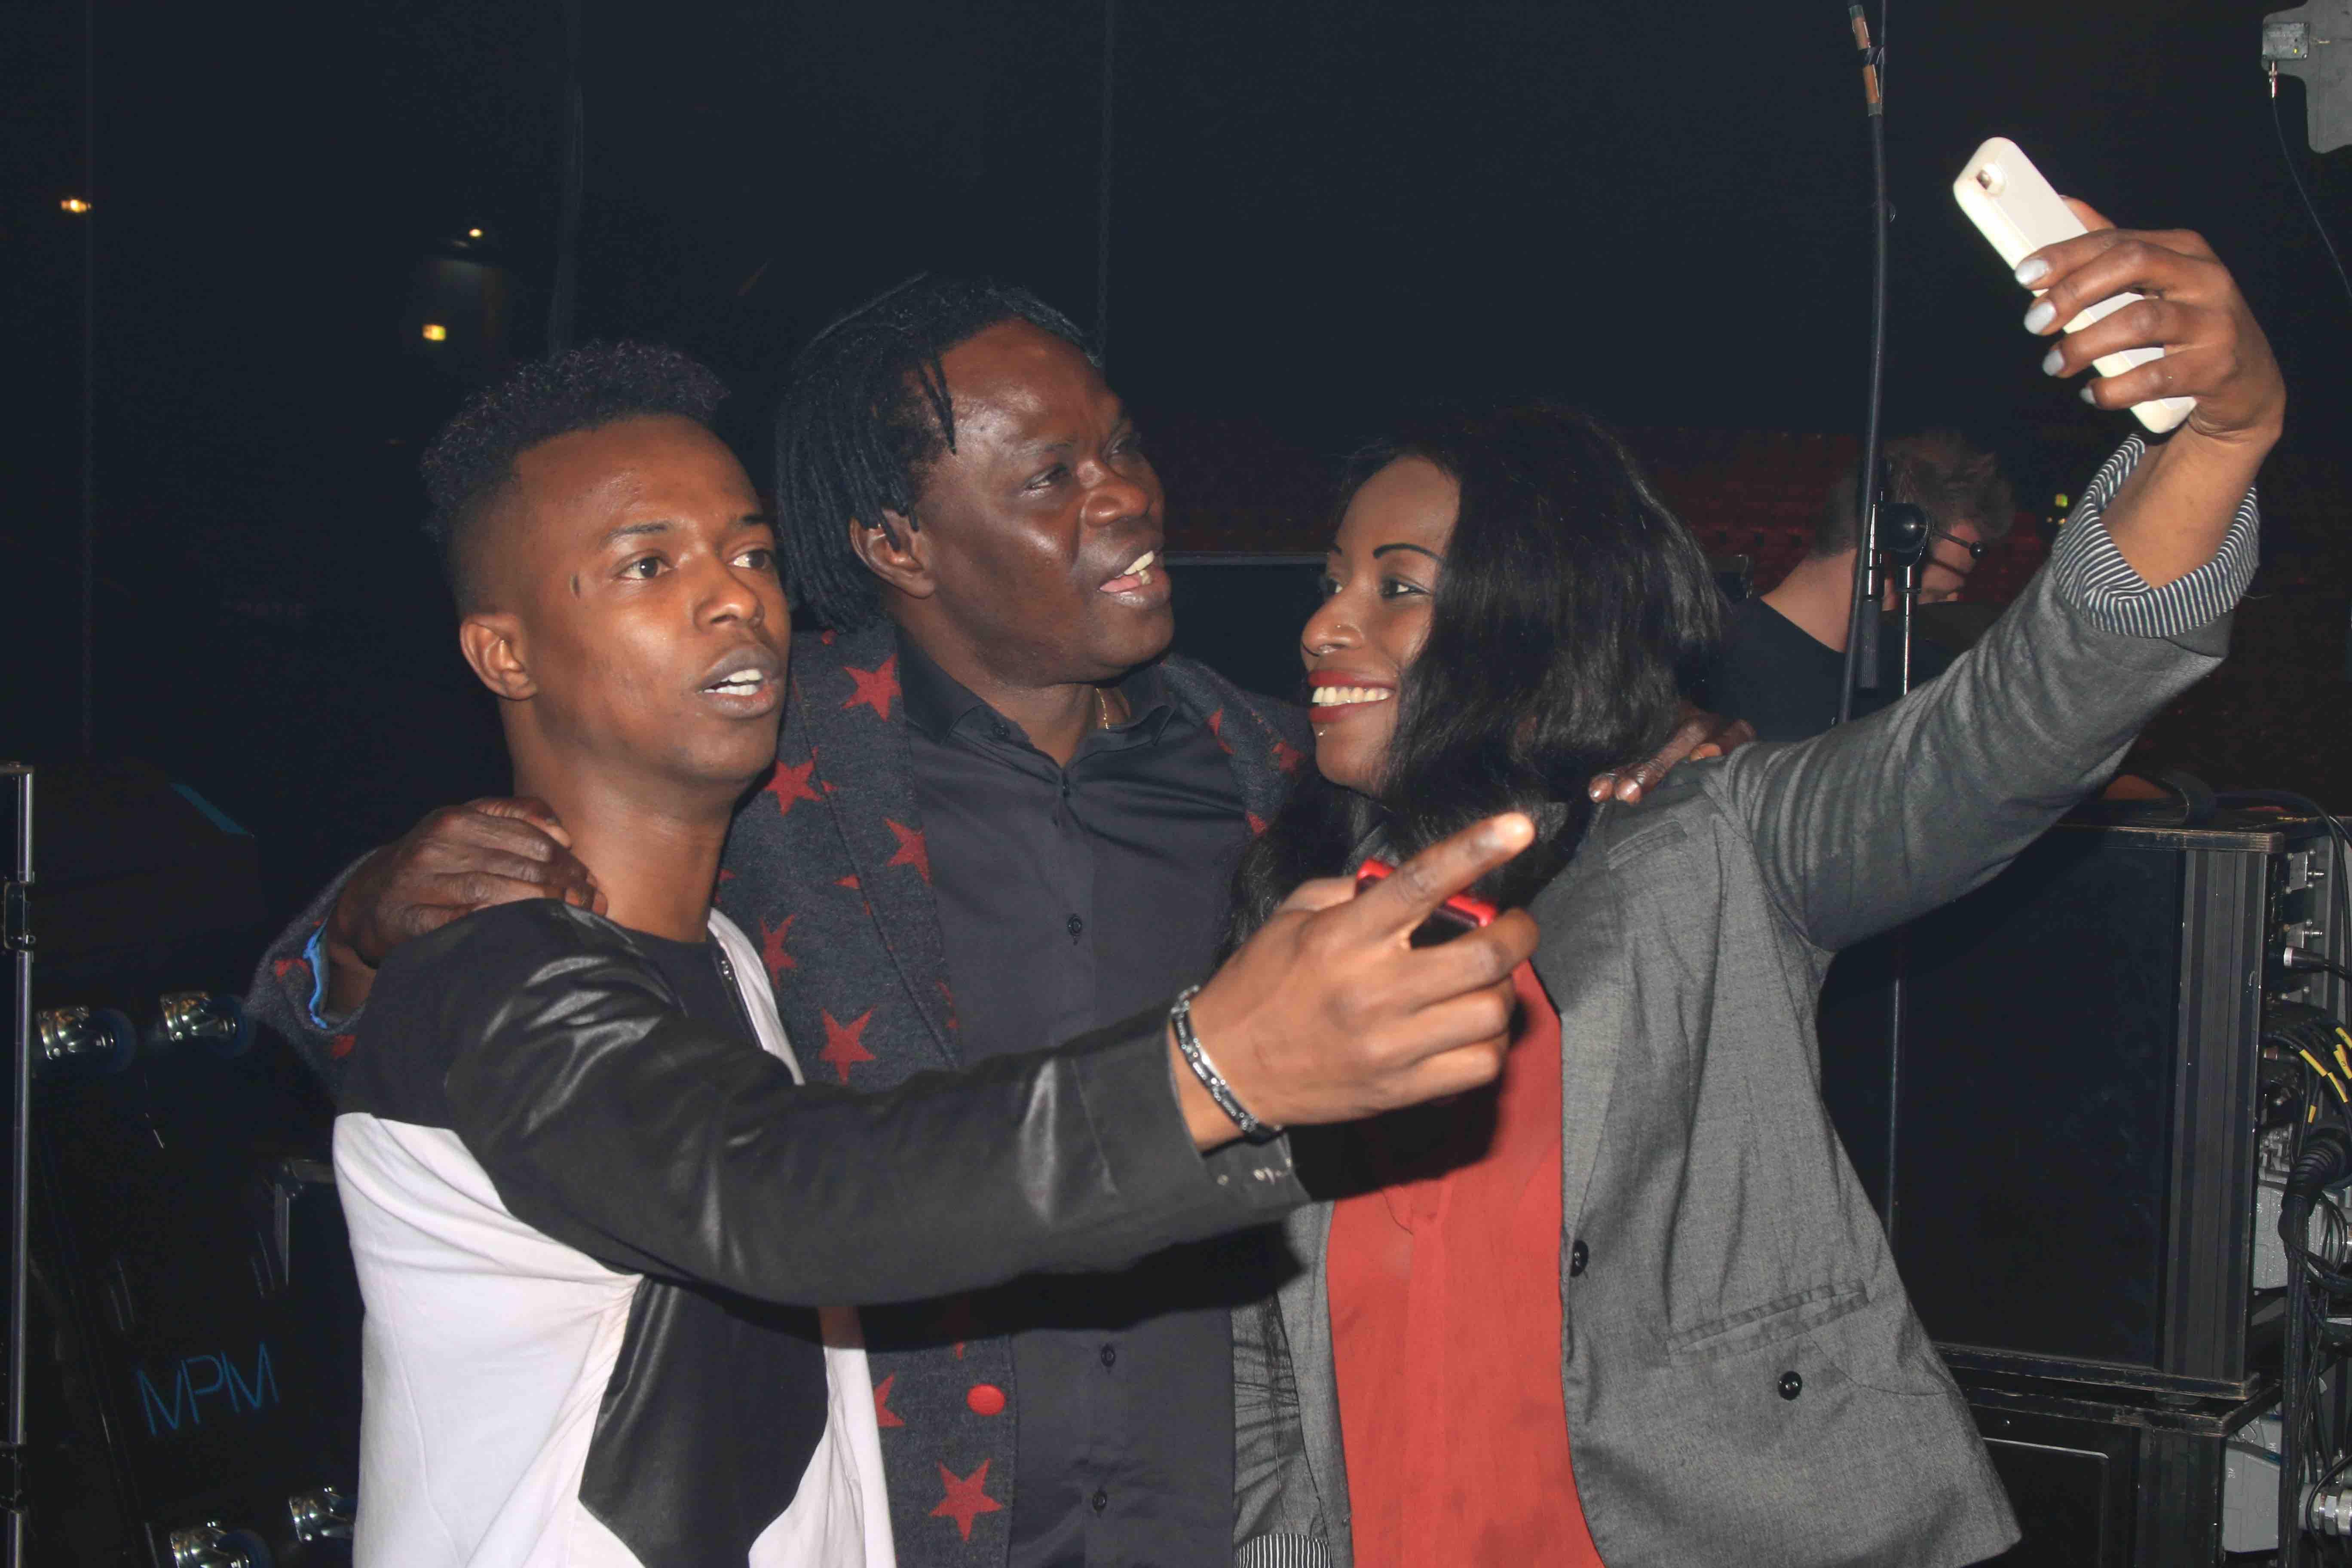 Baba Maal prend un selfie avec ses fans